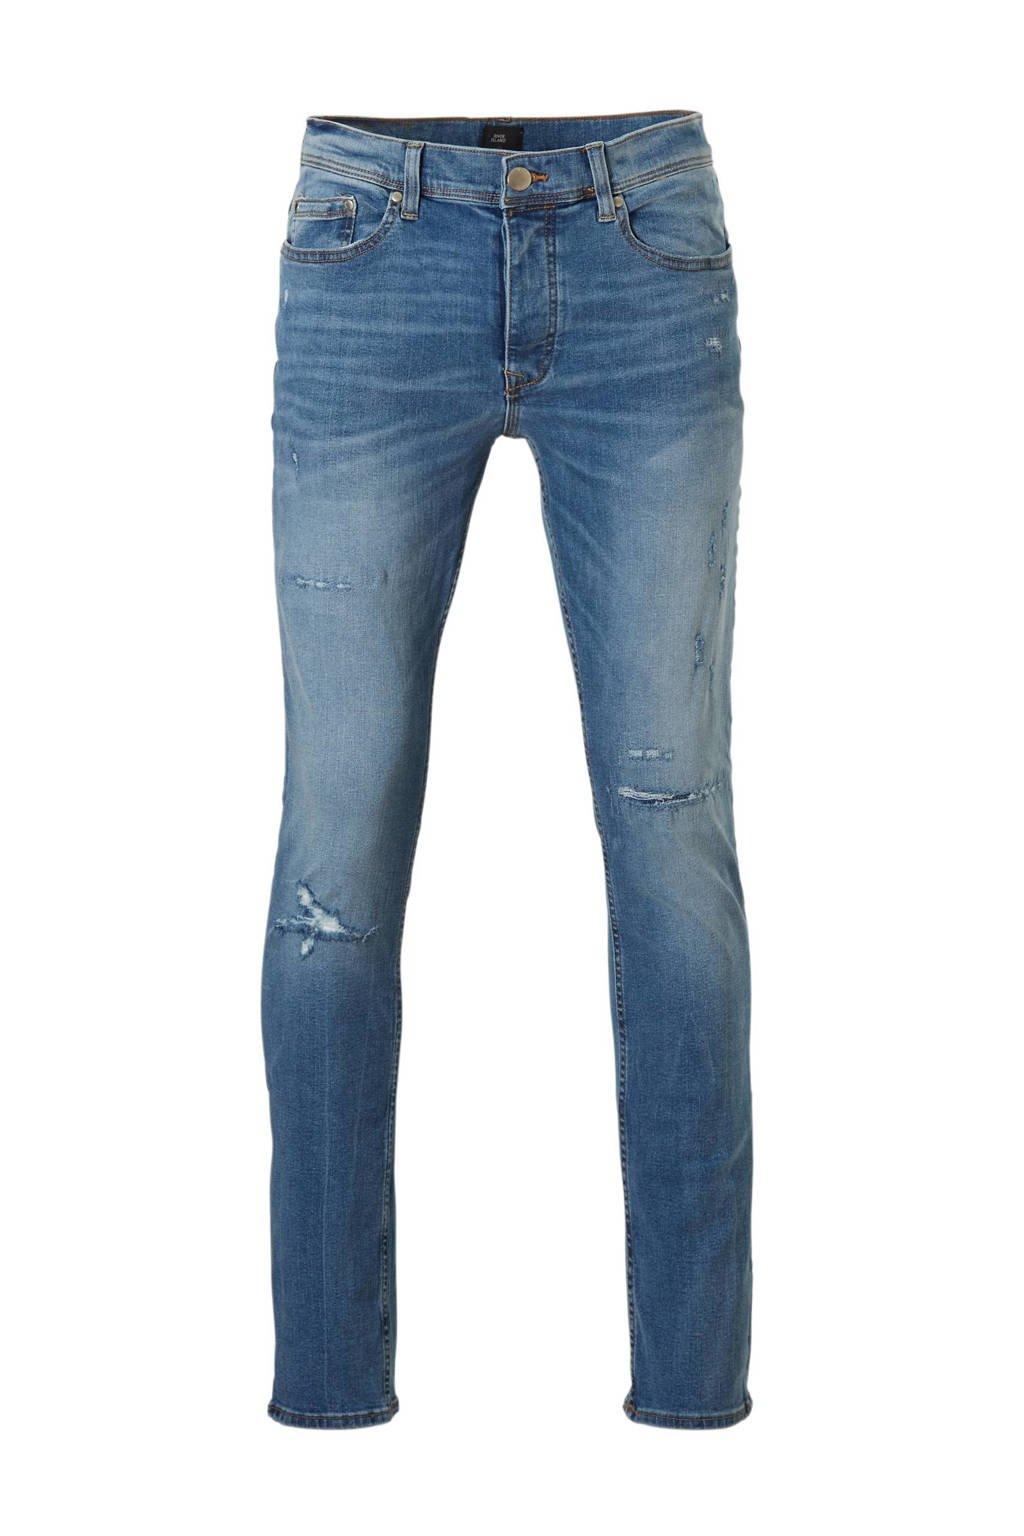 River Island slim fit jeans slijtagedetails, Blauw